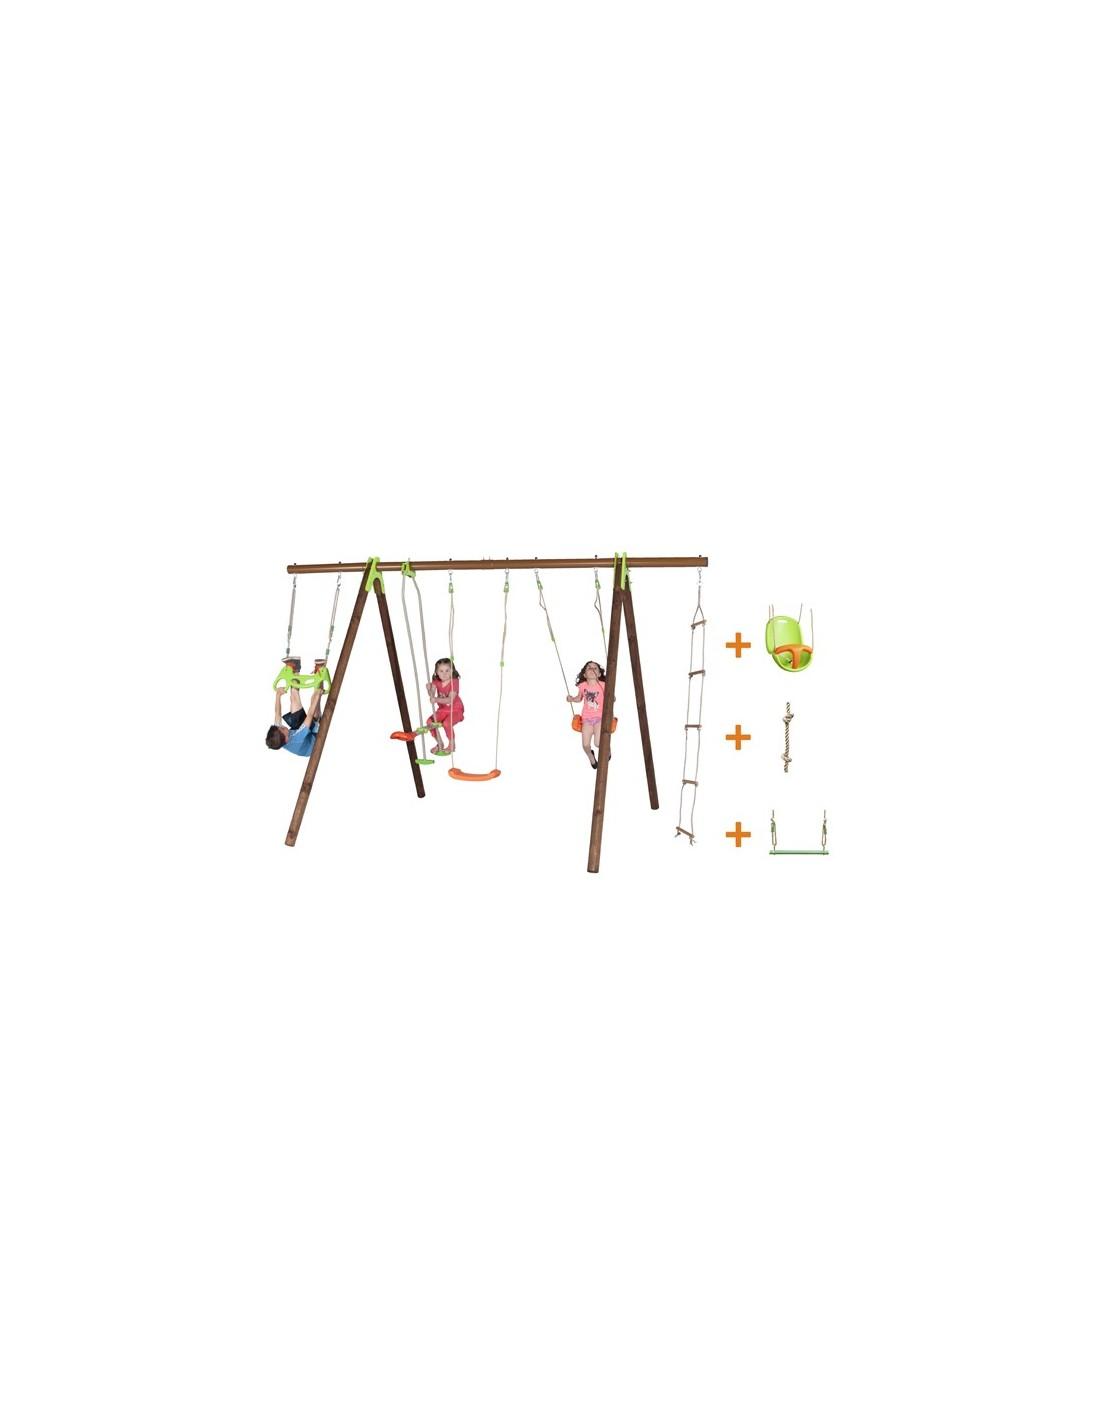 portique bayano bois et m tal 2 3 m enfants 5 12 ans. Black Bedroom Furniture Sets. Home Design Ideas